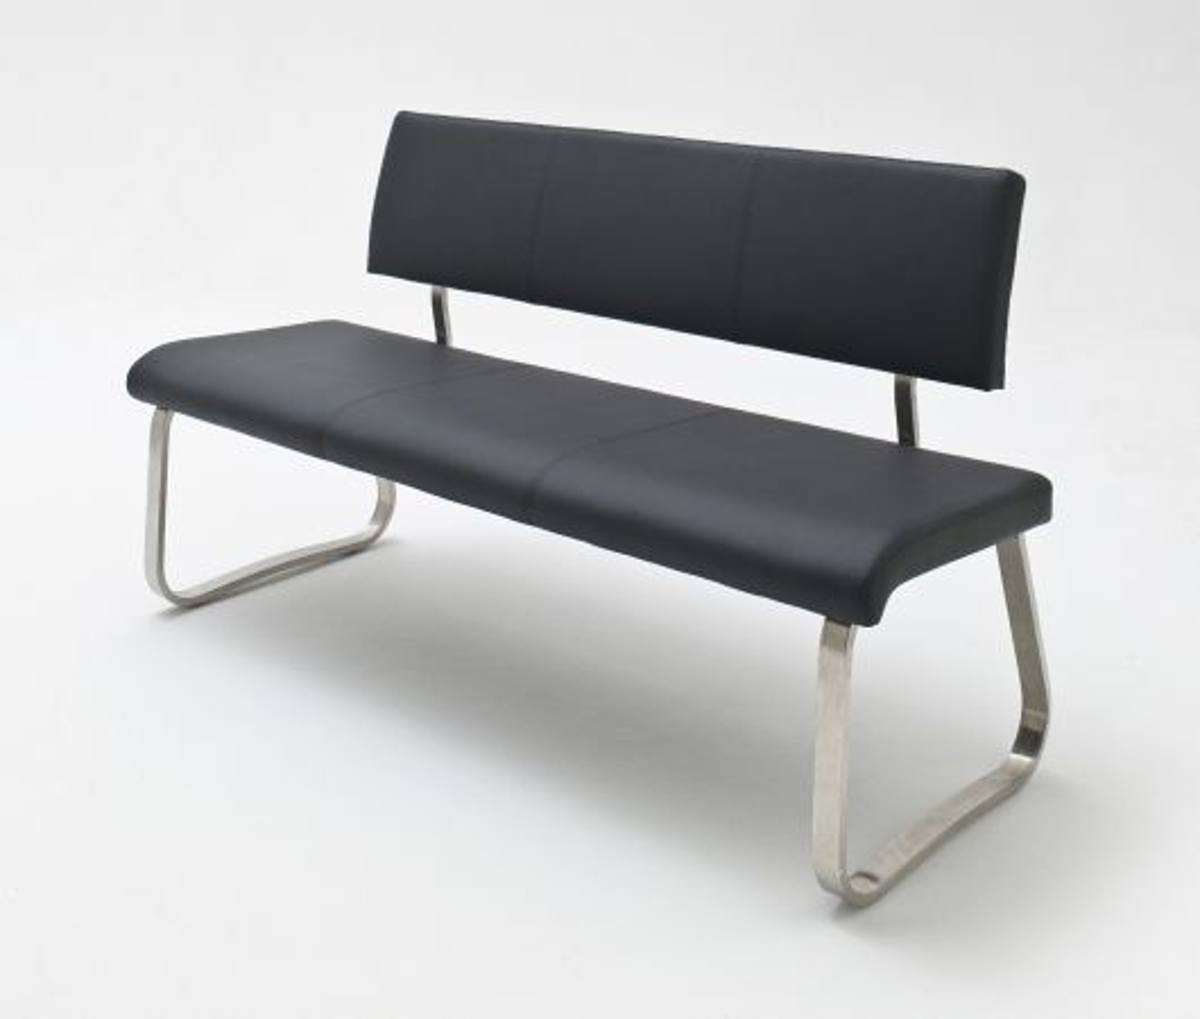 Sitzbank Arco Schwarz Leder 155 cm